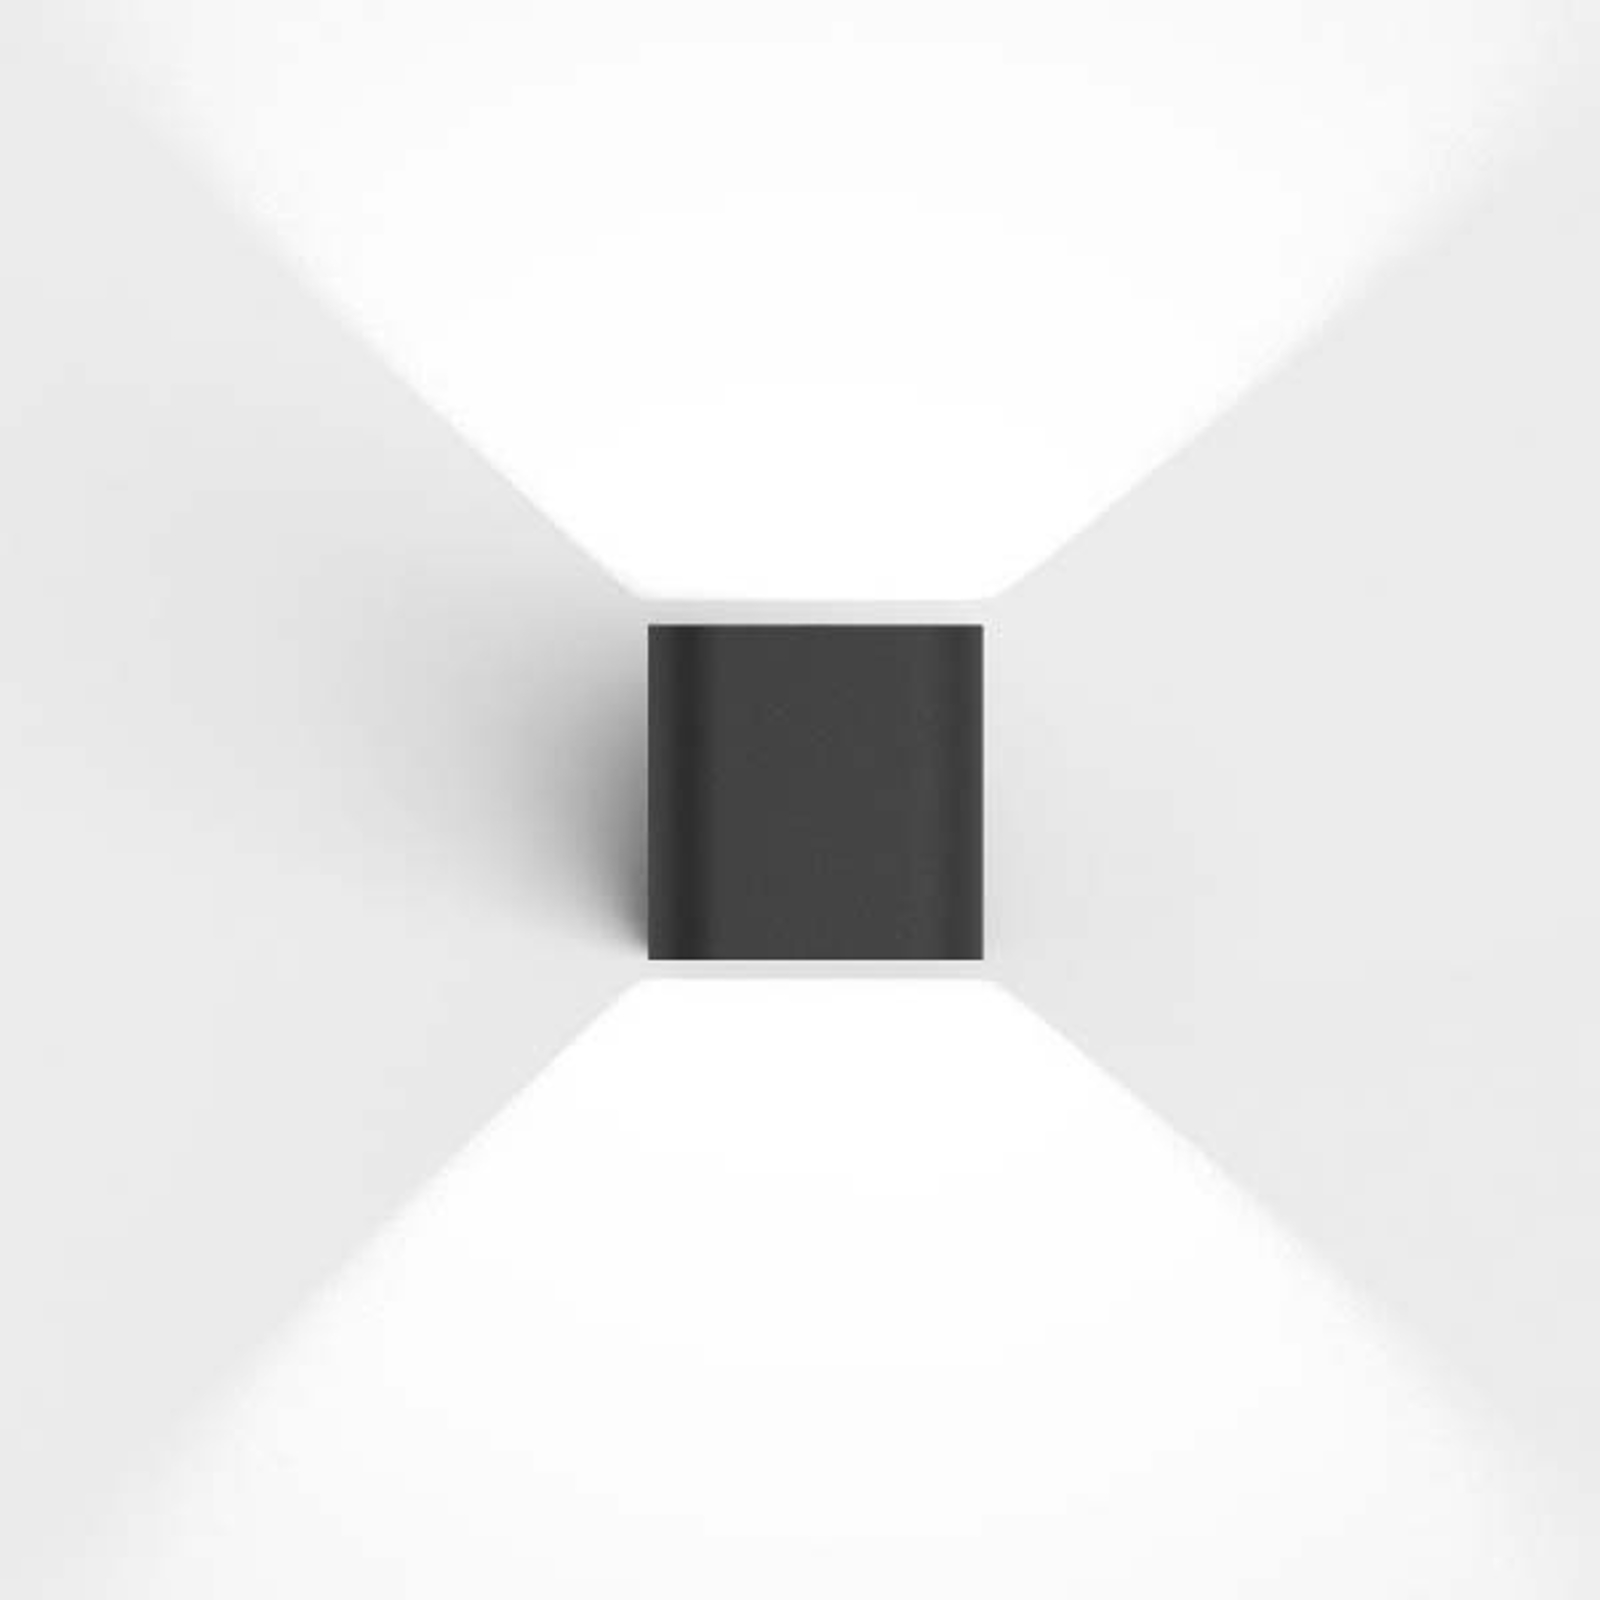 IP44.de Intro 2.0 LED buitenwandlamp, antraciet